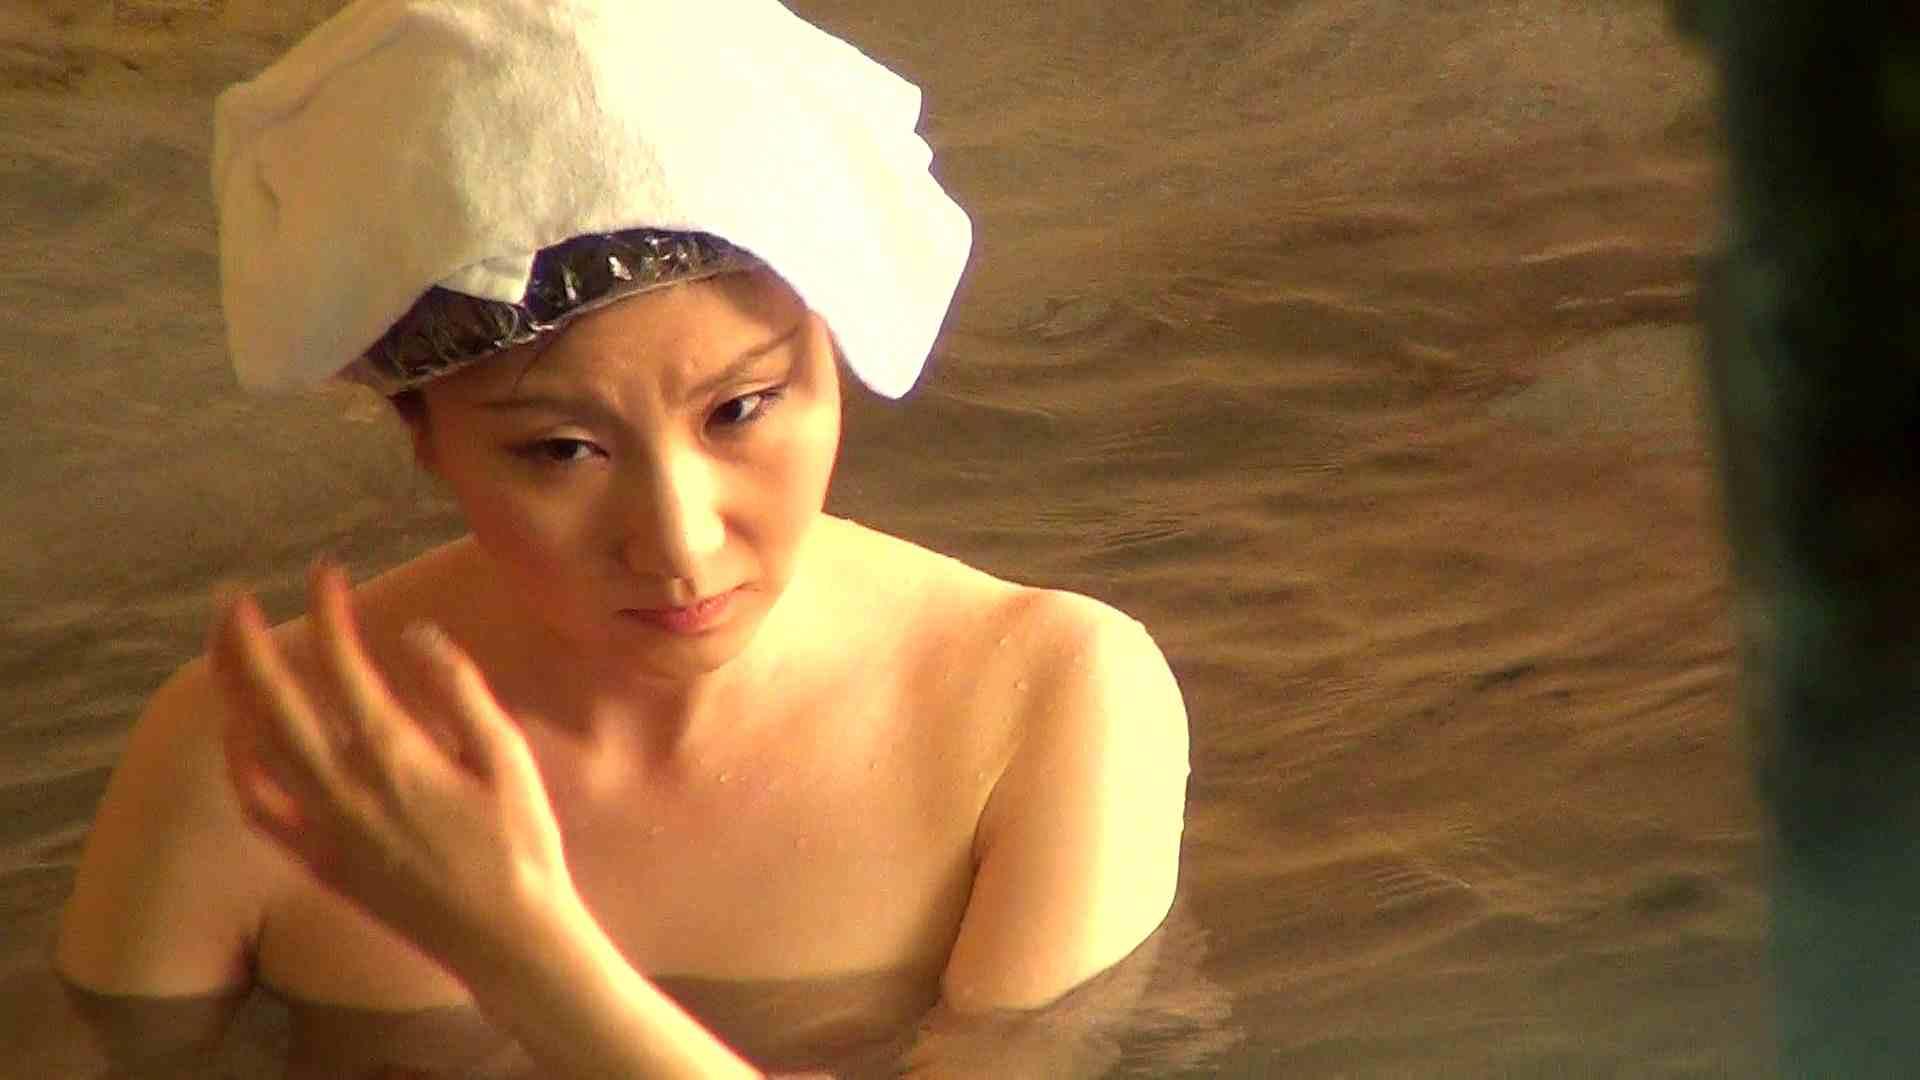 Aquaな露天風呂Vol.278 OLセックス 覗きオメコ動画キャプチャ 100画像 41